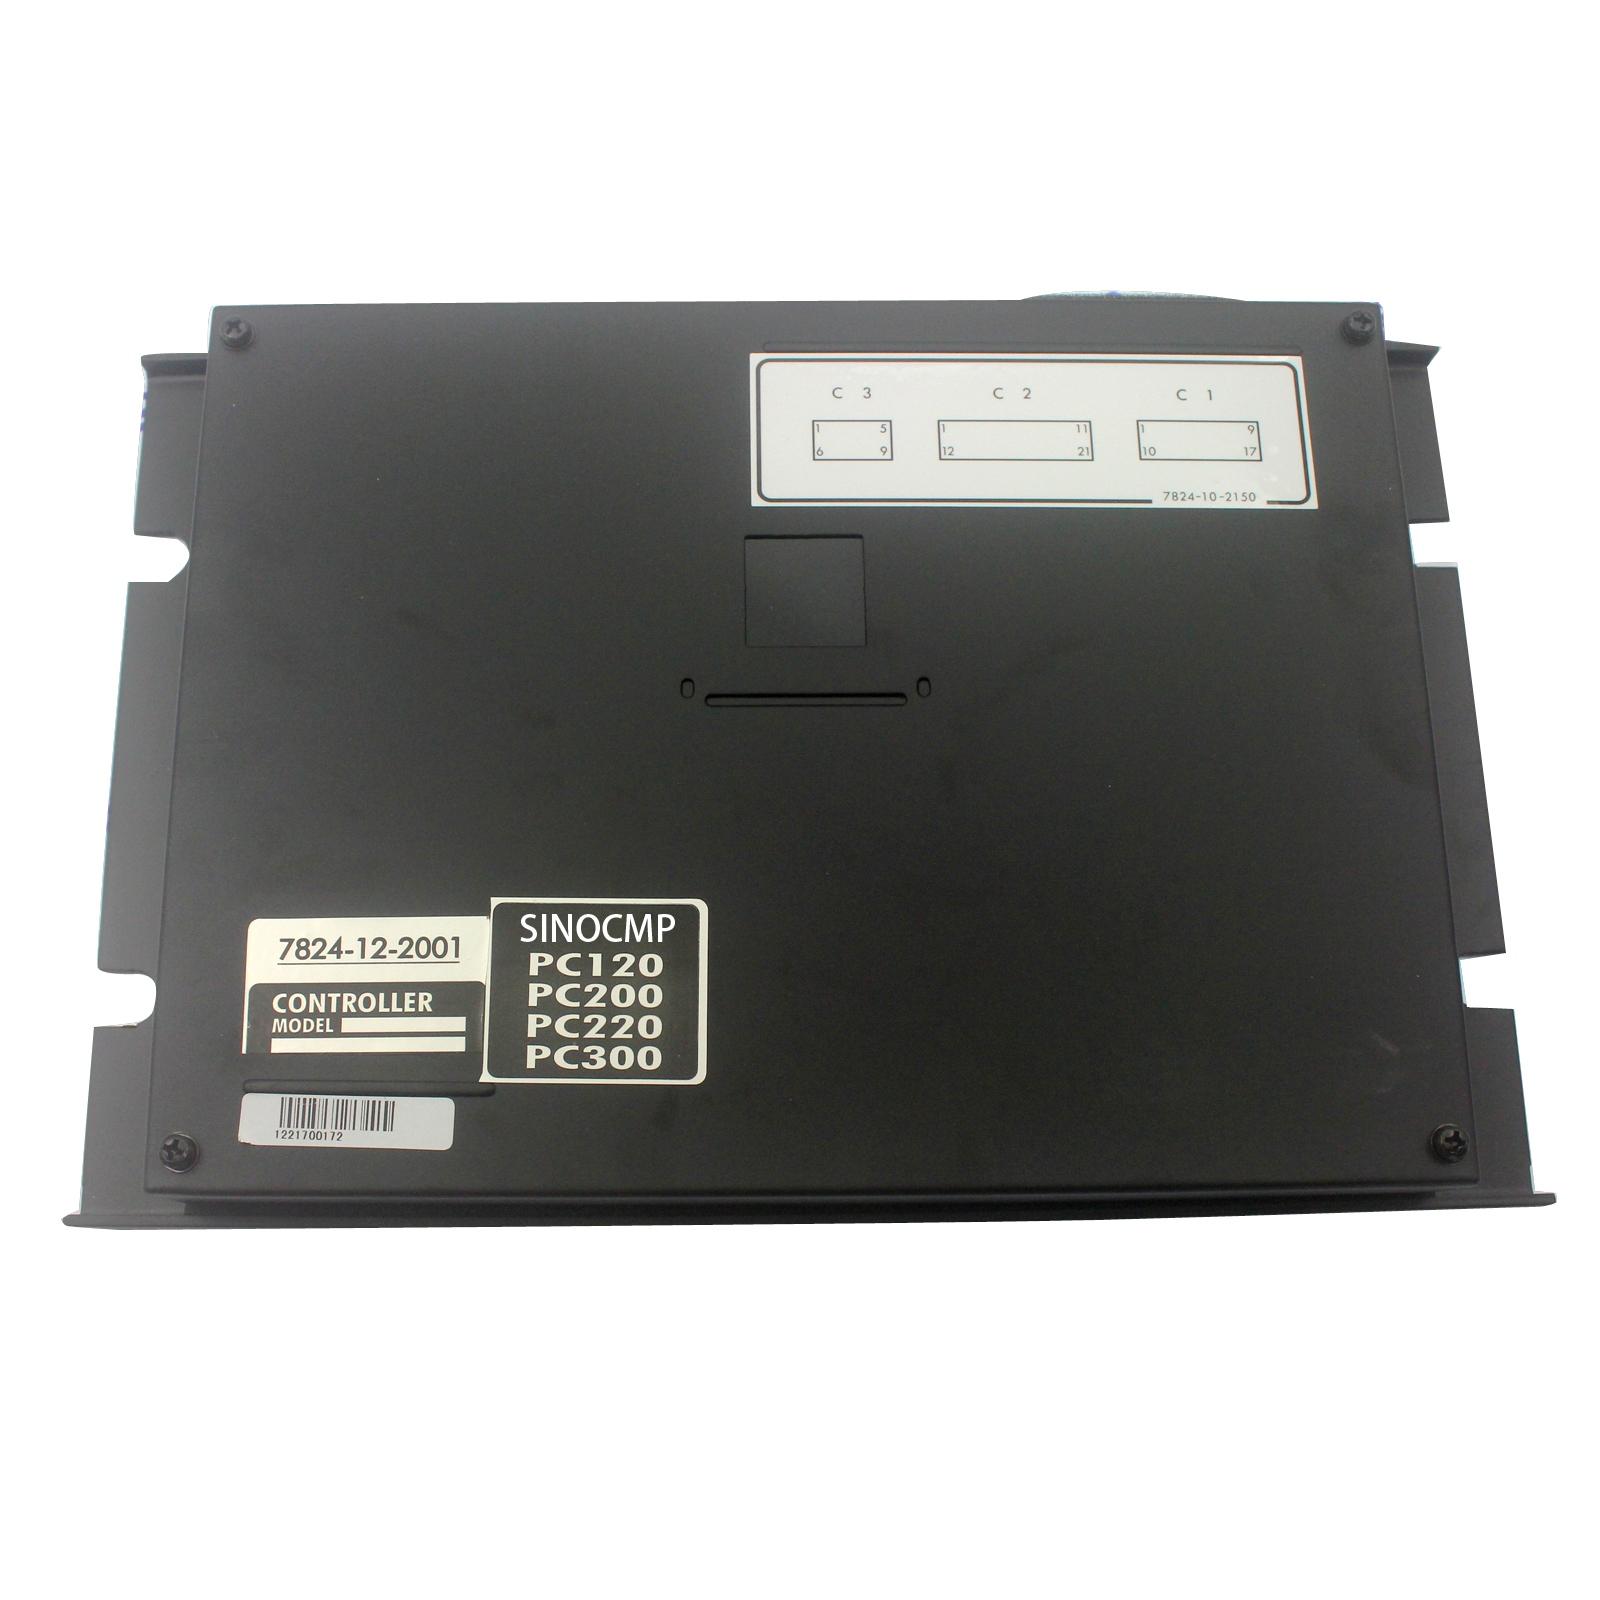 Komatsu PC200-5 PC220-5 Controller Control Panel 7824-12-2001 for Excavator  Assy